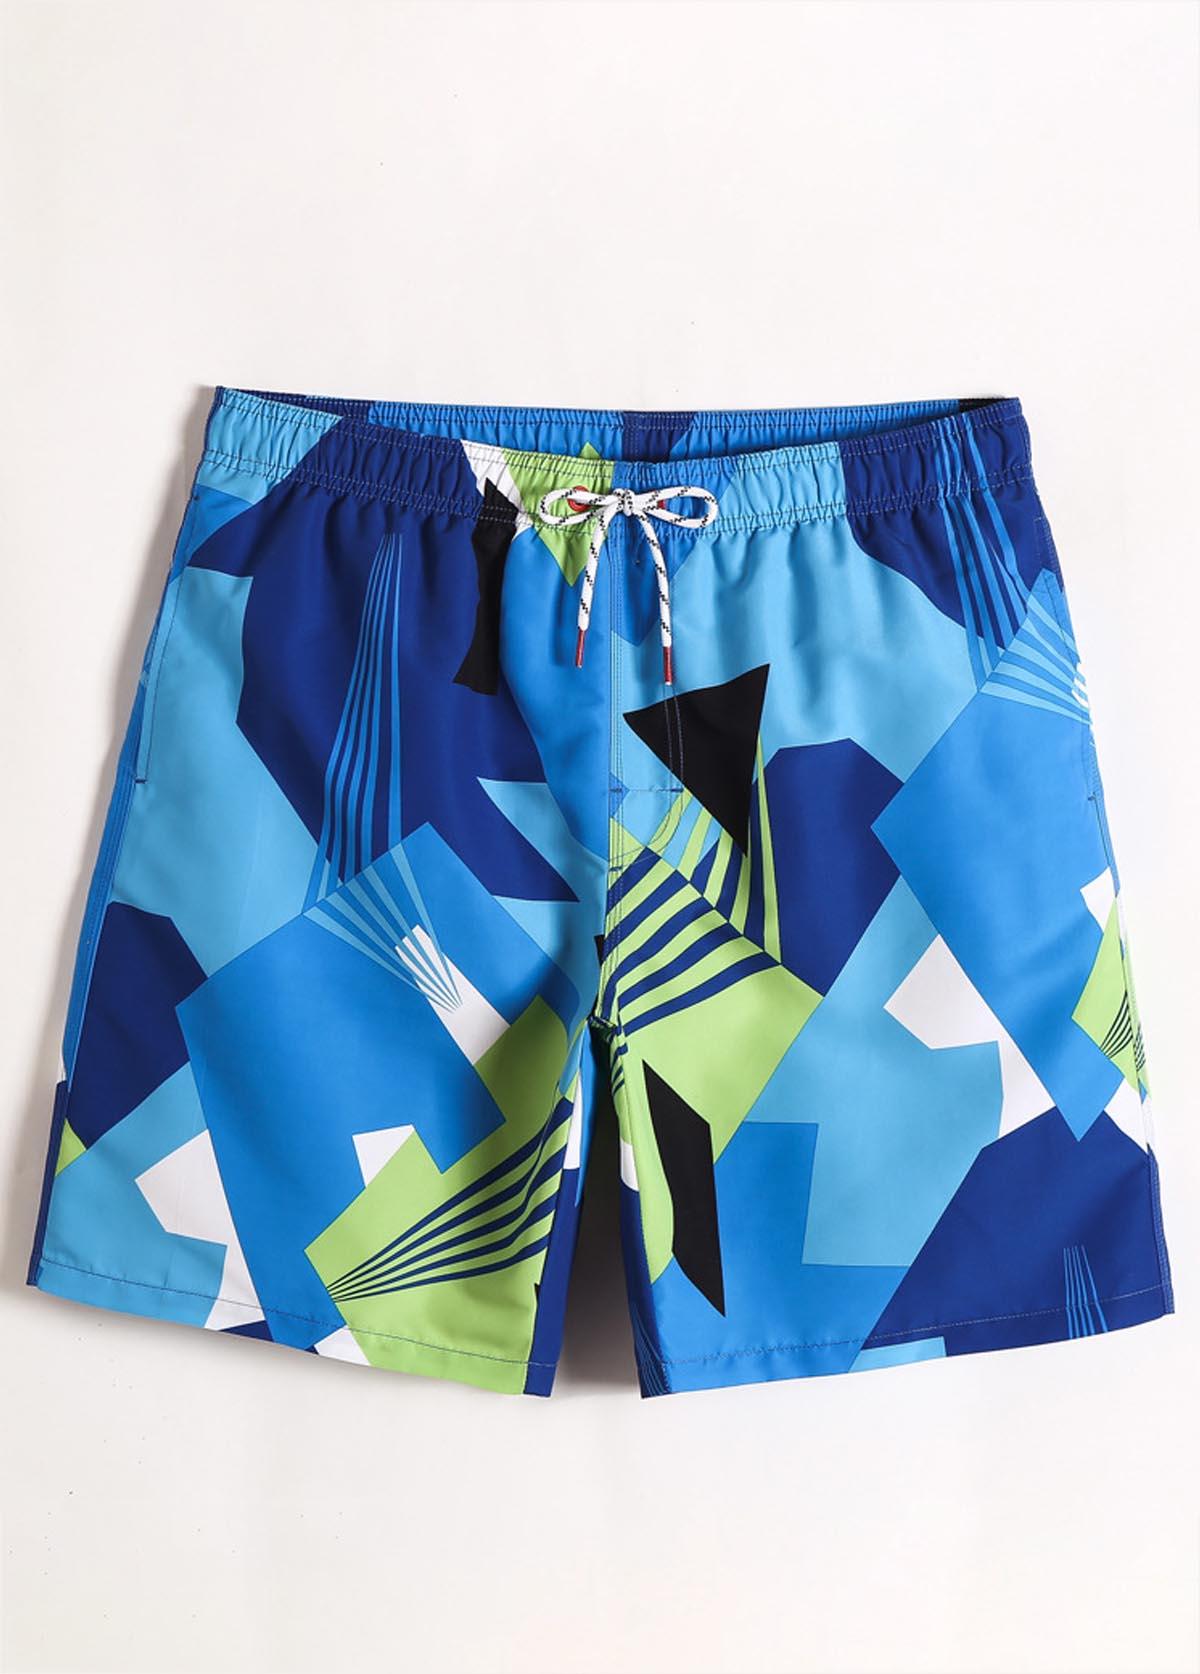 Printed Quick Dry Bermuda Men's Swimwear Trunk